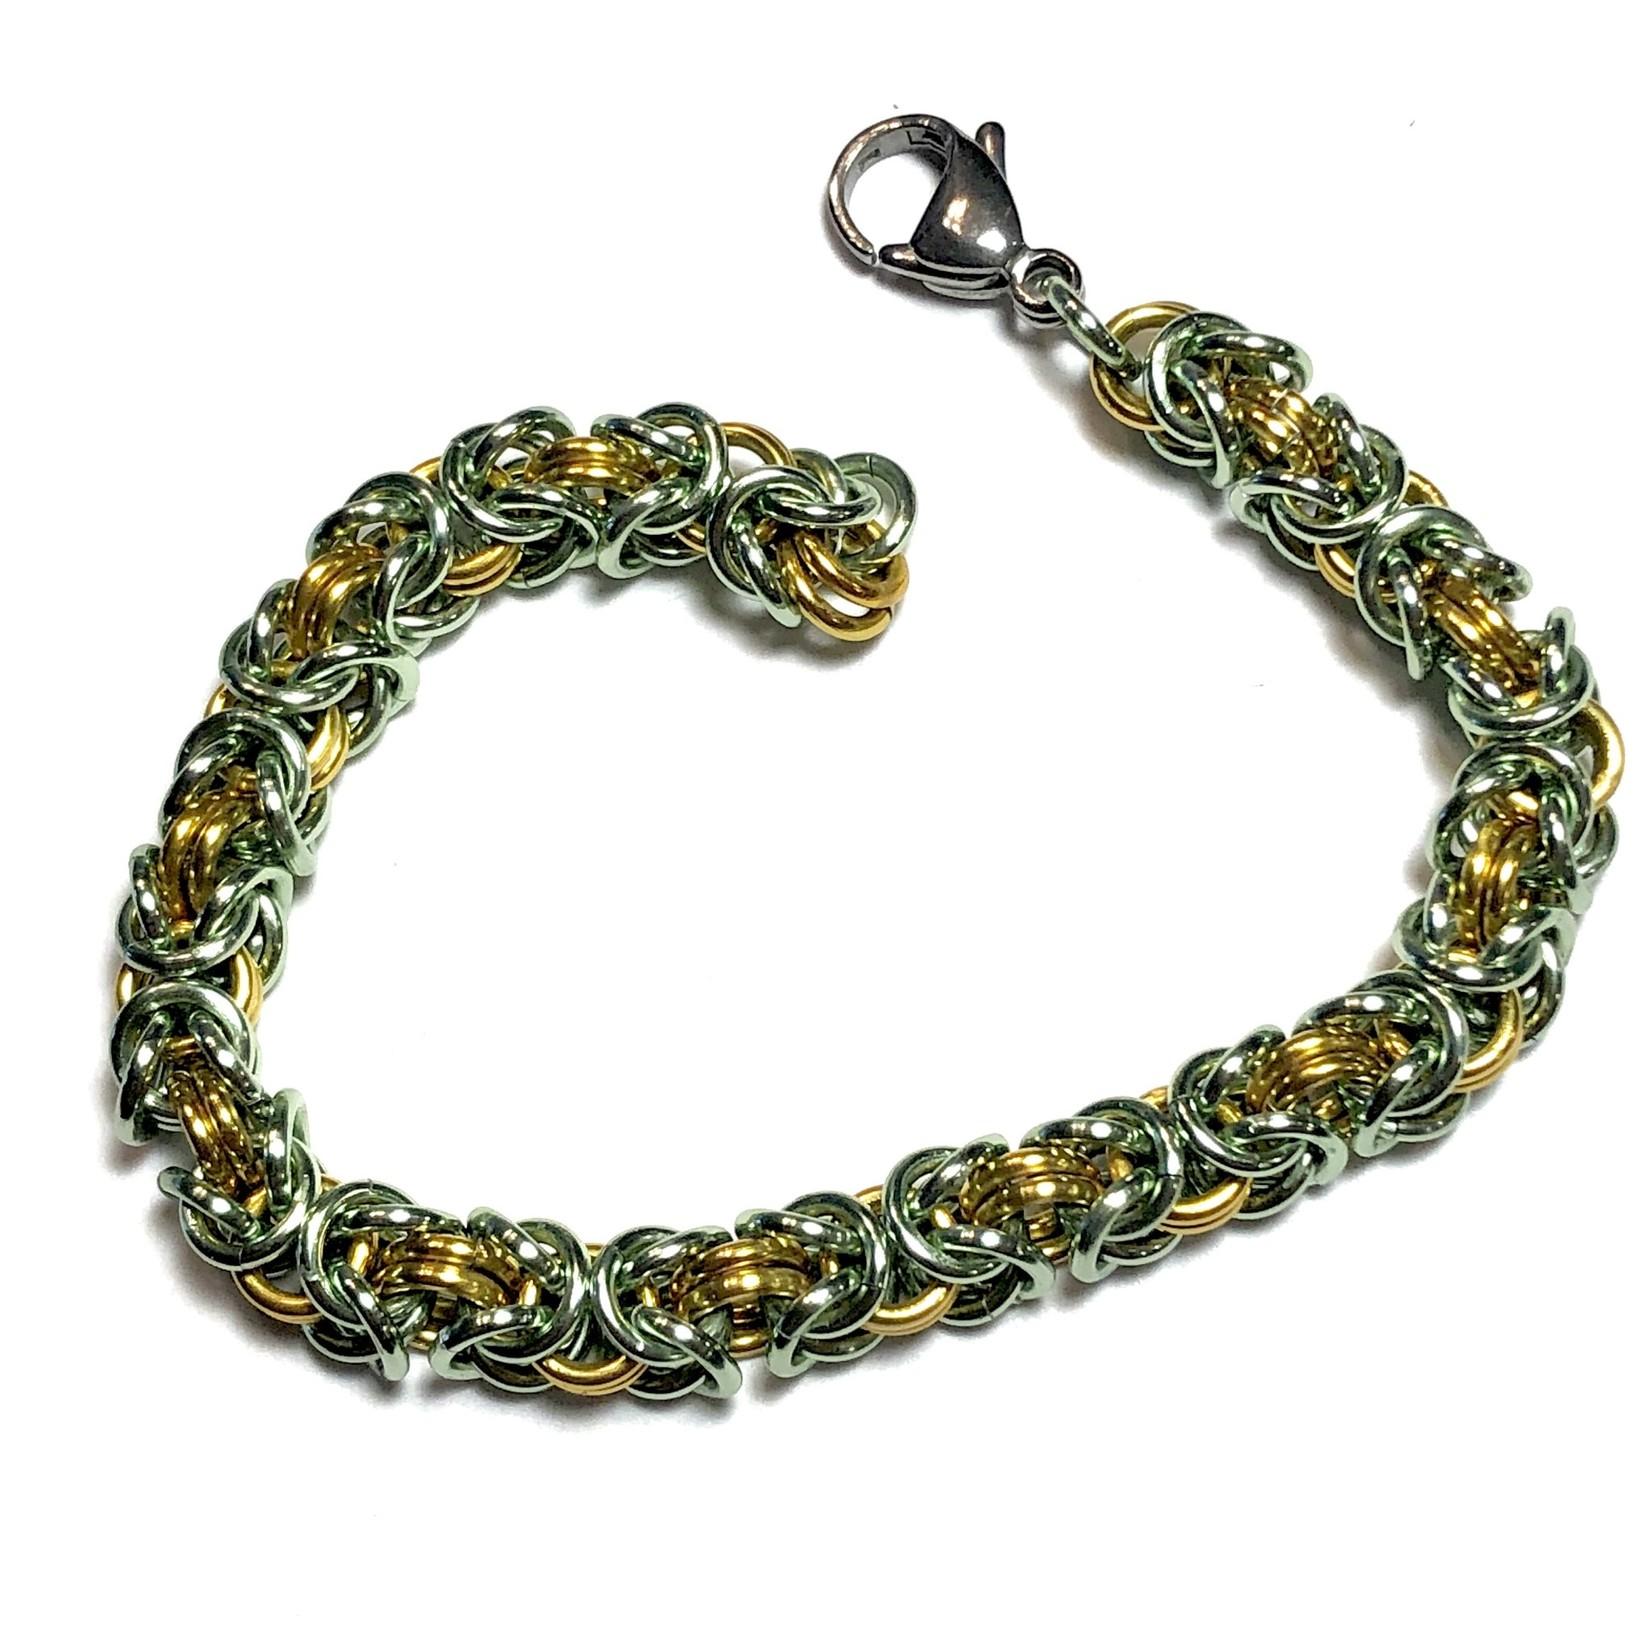 Hyperlinks Chain Maille Two-Tone Byzantine Bracelet Kit Gold & Seafoam